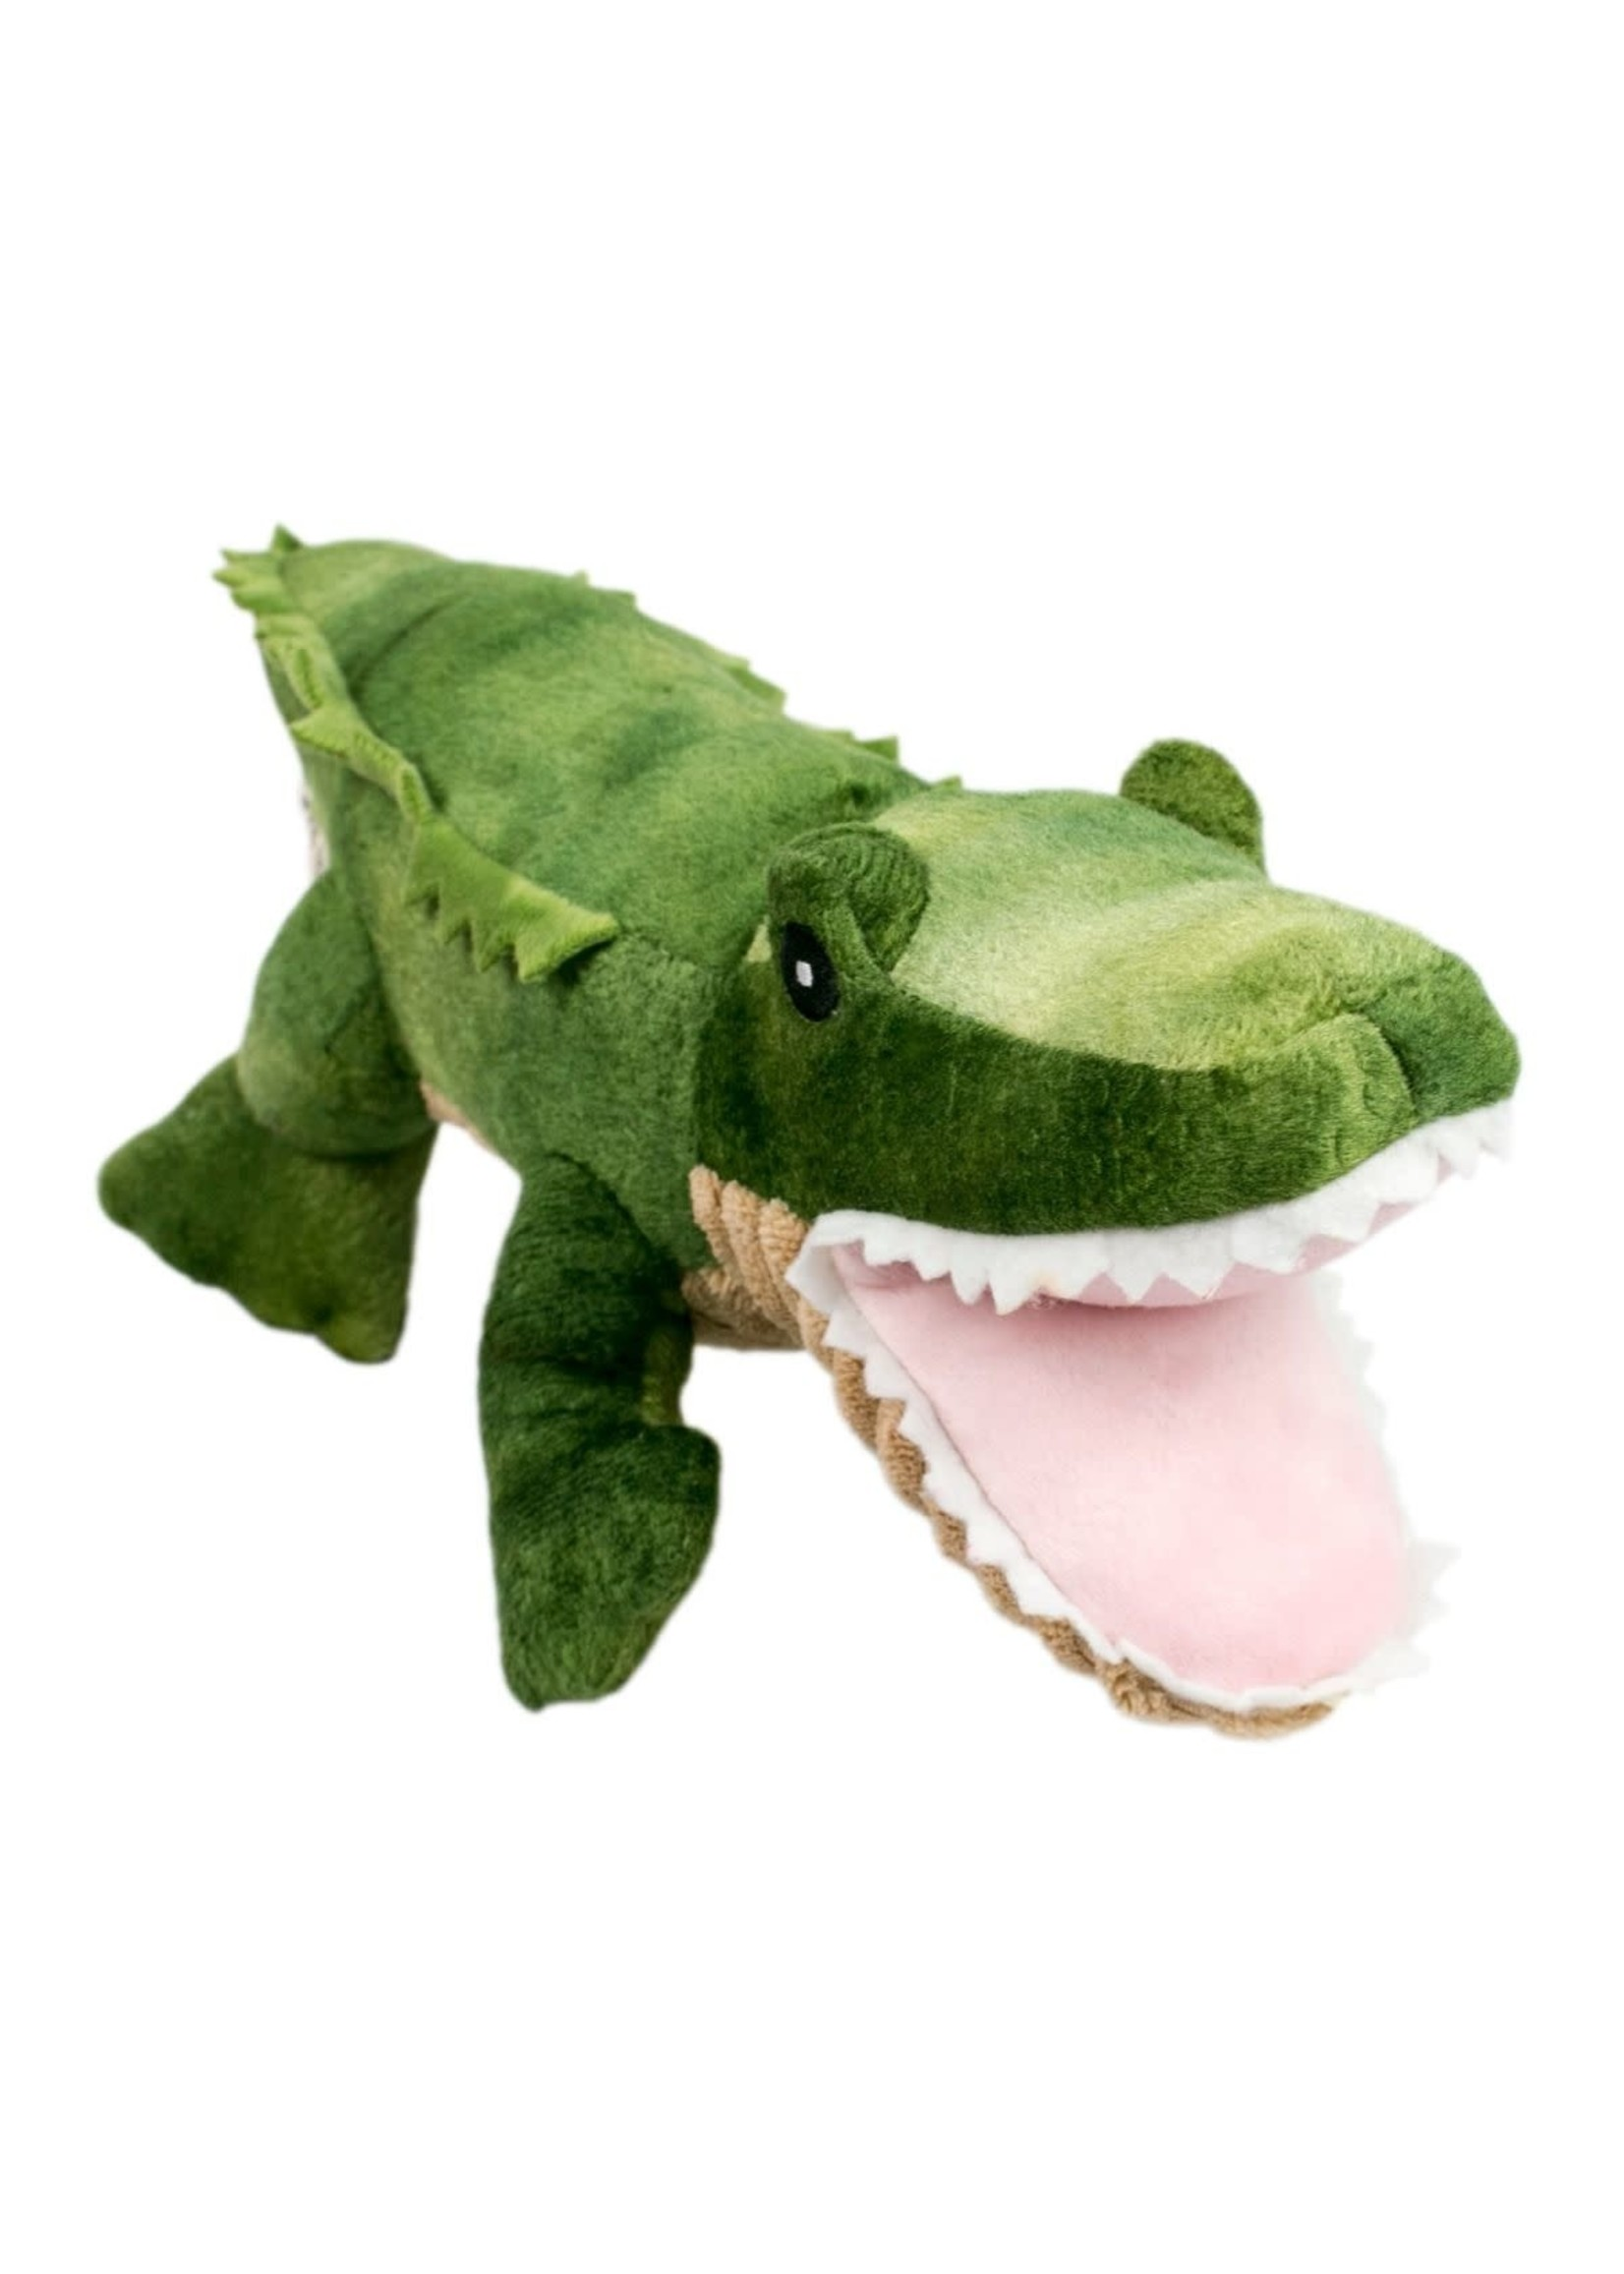 "Tall Tails Tall Tails Plush Crunch Gator 15"""